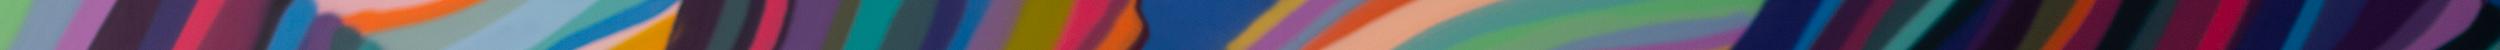 50pt_horizontalRainbowBar_Option1.png